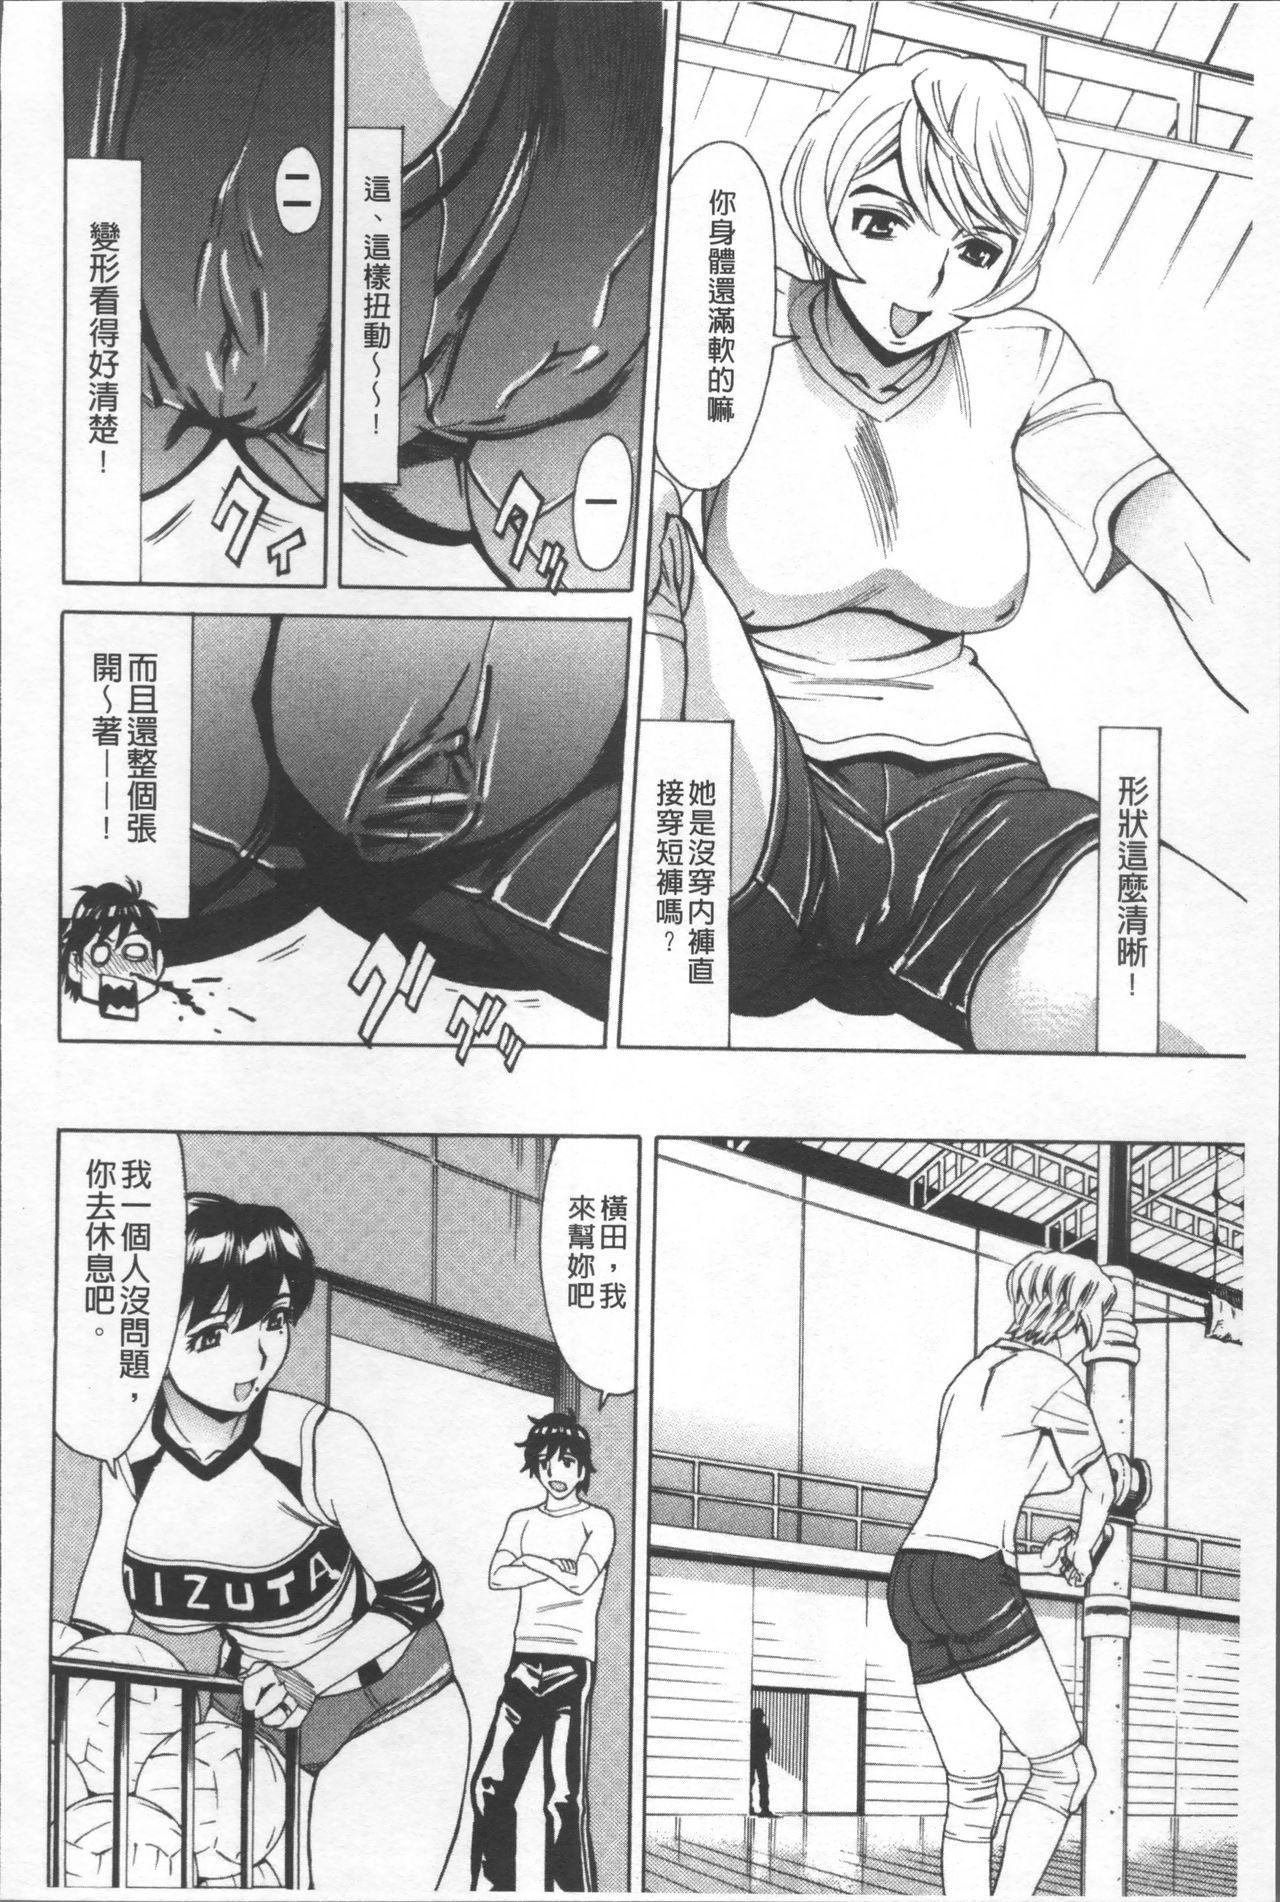 Hitozuma Kanshasai - SUPER EROTIC WIFE'S FESTIVAL 125